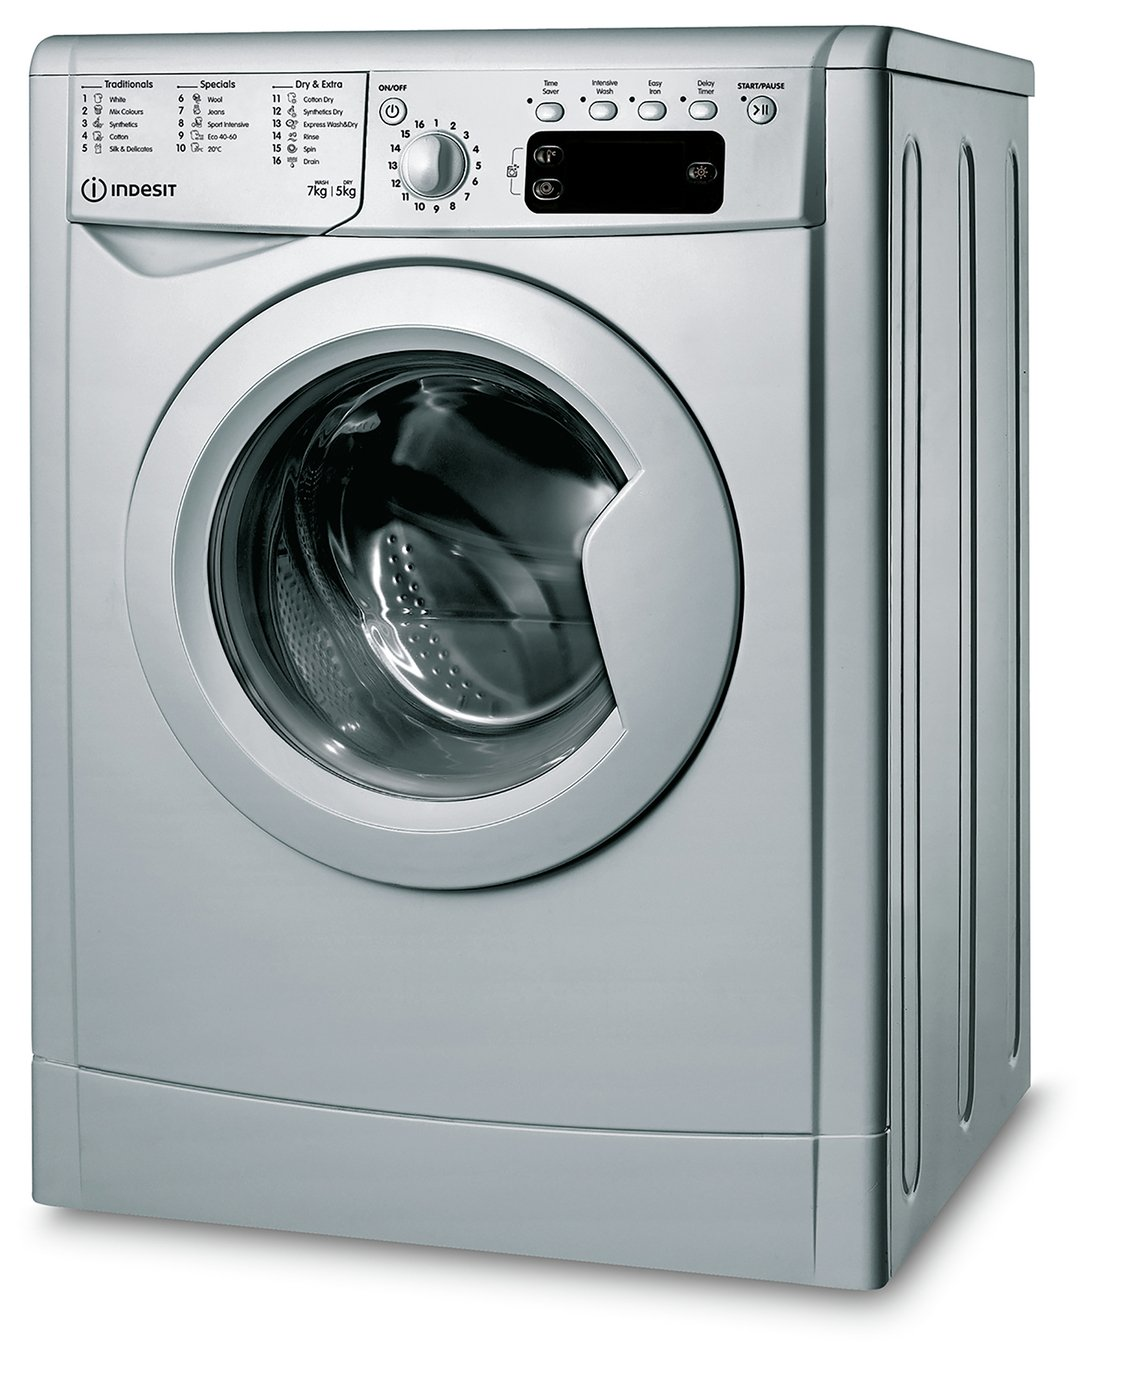 Indesit IWDD7145S 7KG/5KG 1400 Spin Washer Dryer - Silver